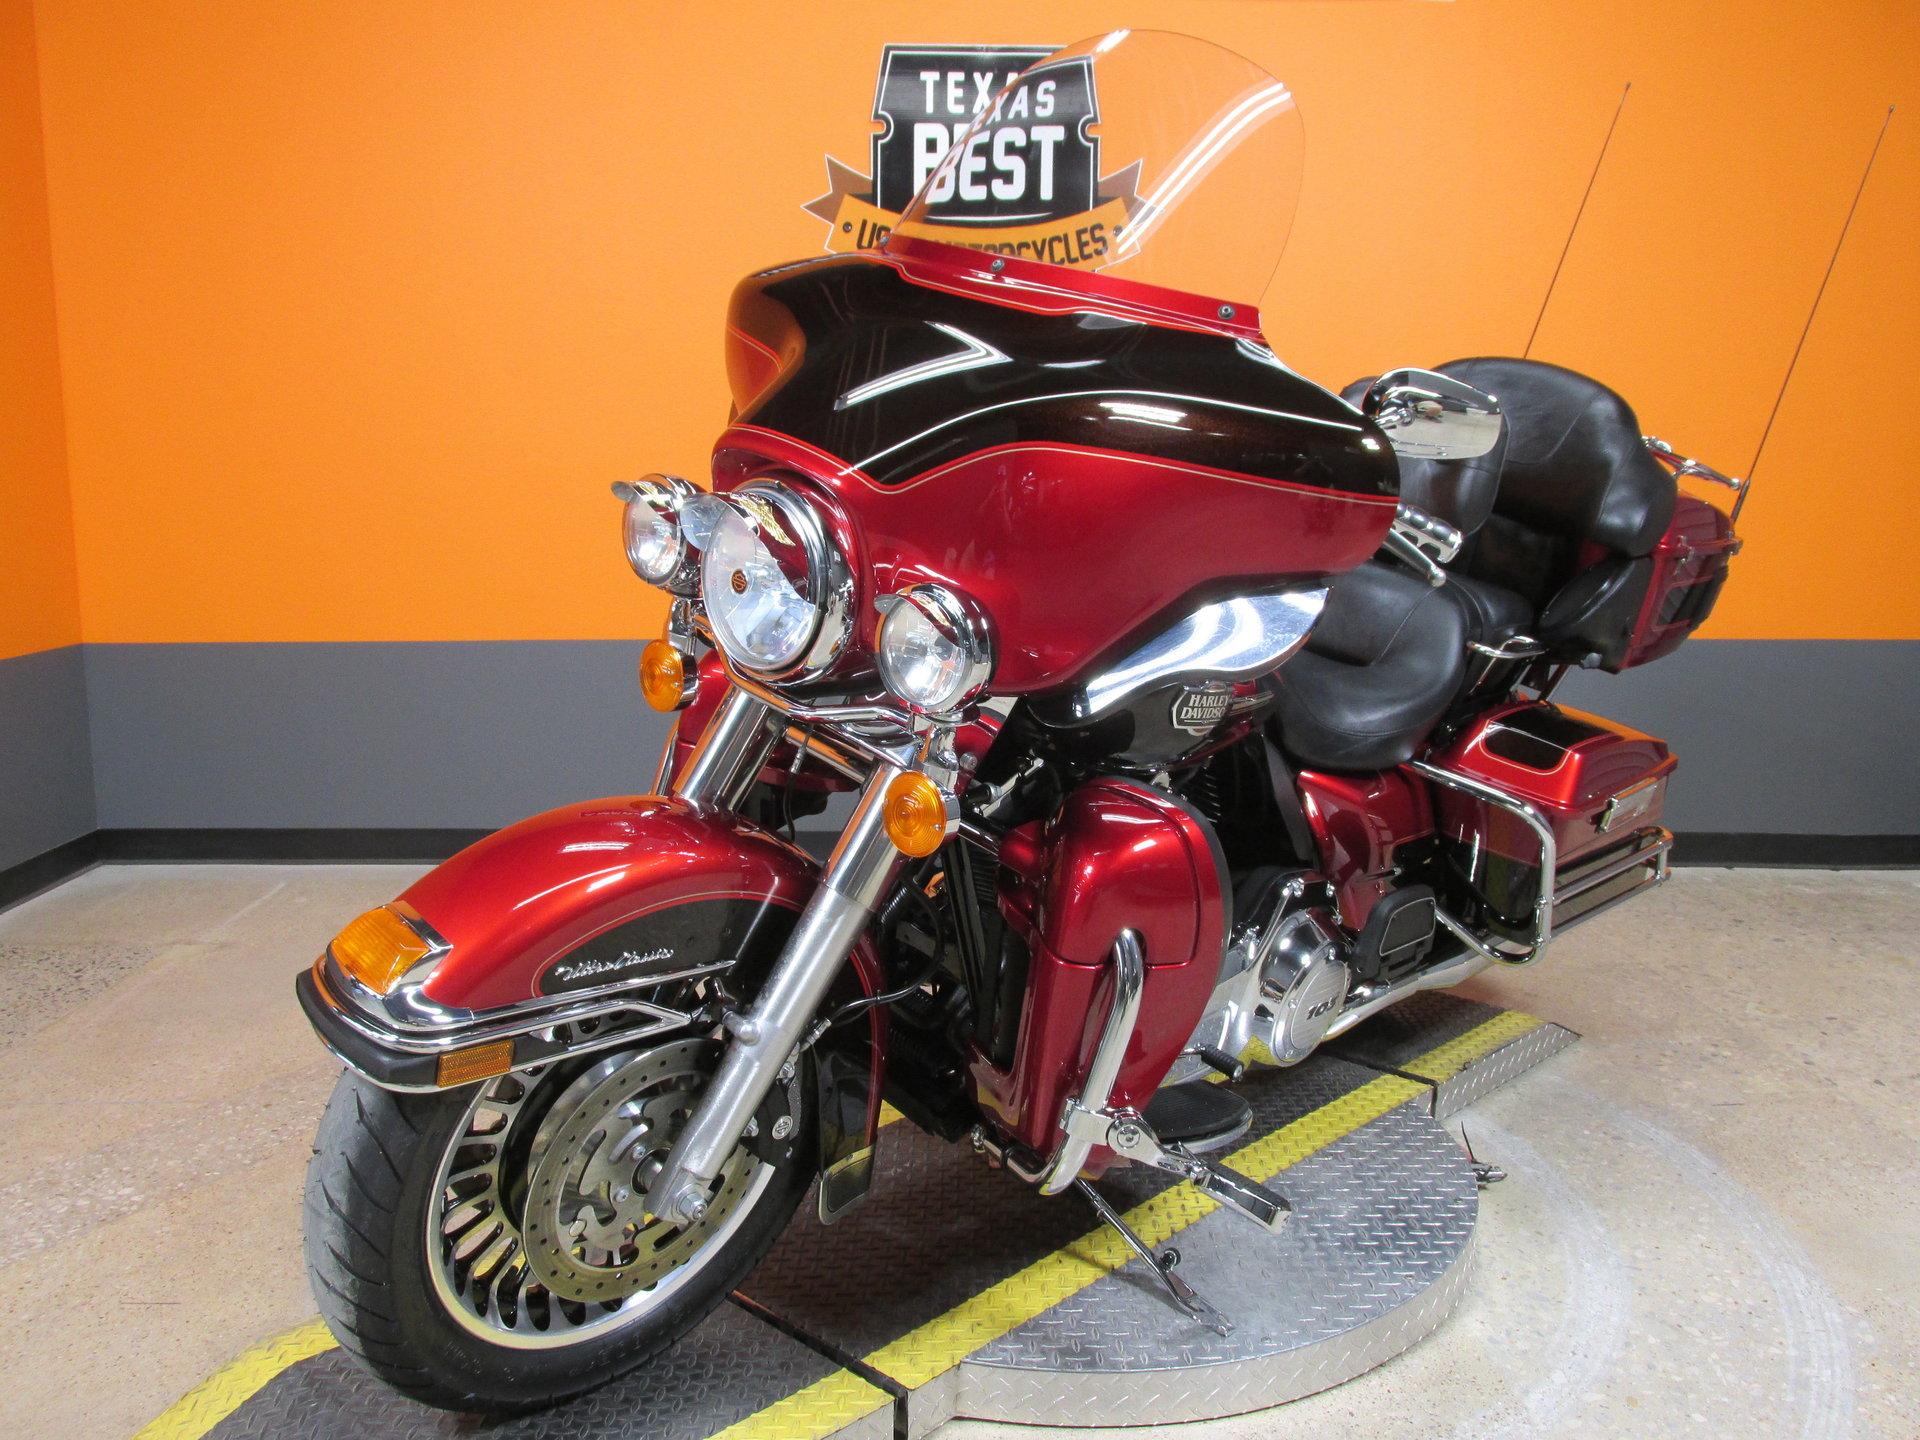 2012 Harley Davidson Ultra Classic Berlin Motors Red For Sale